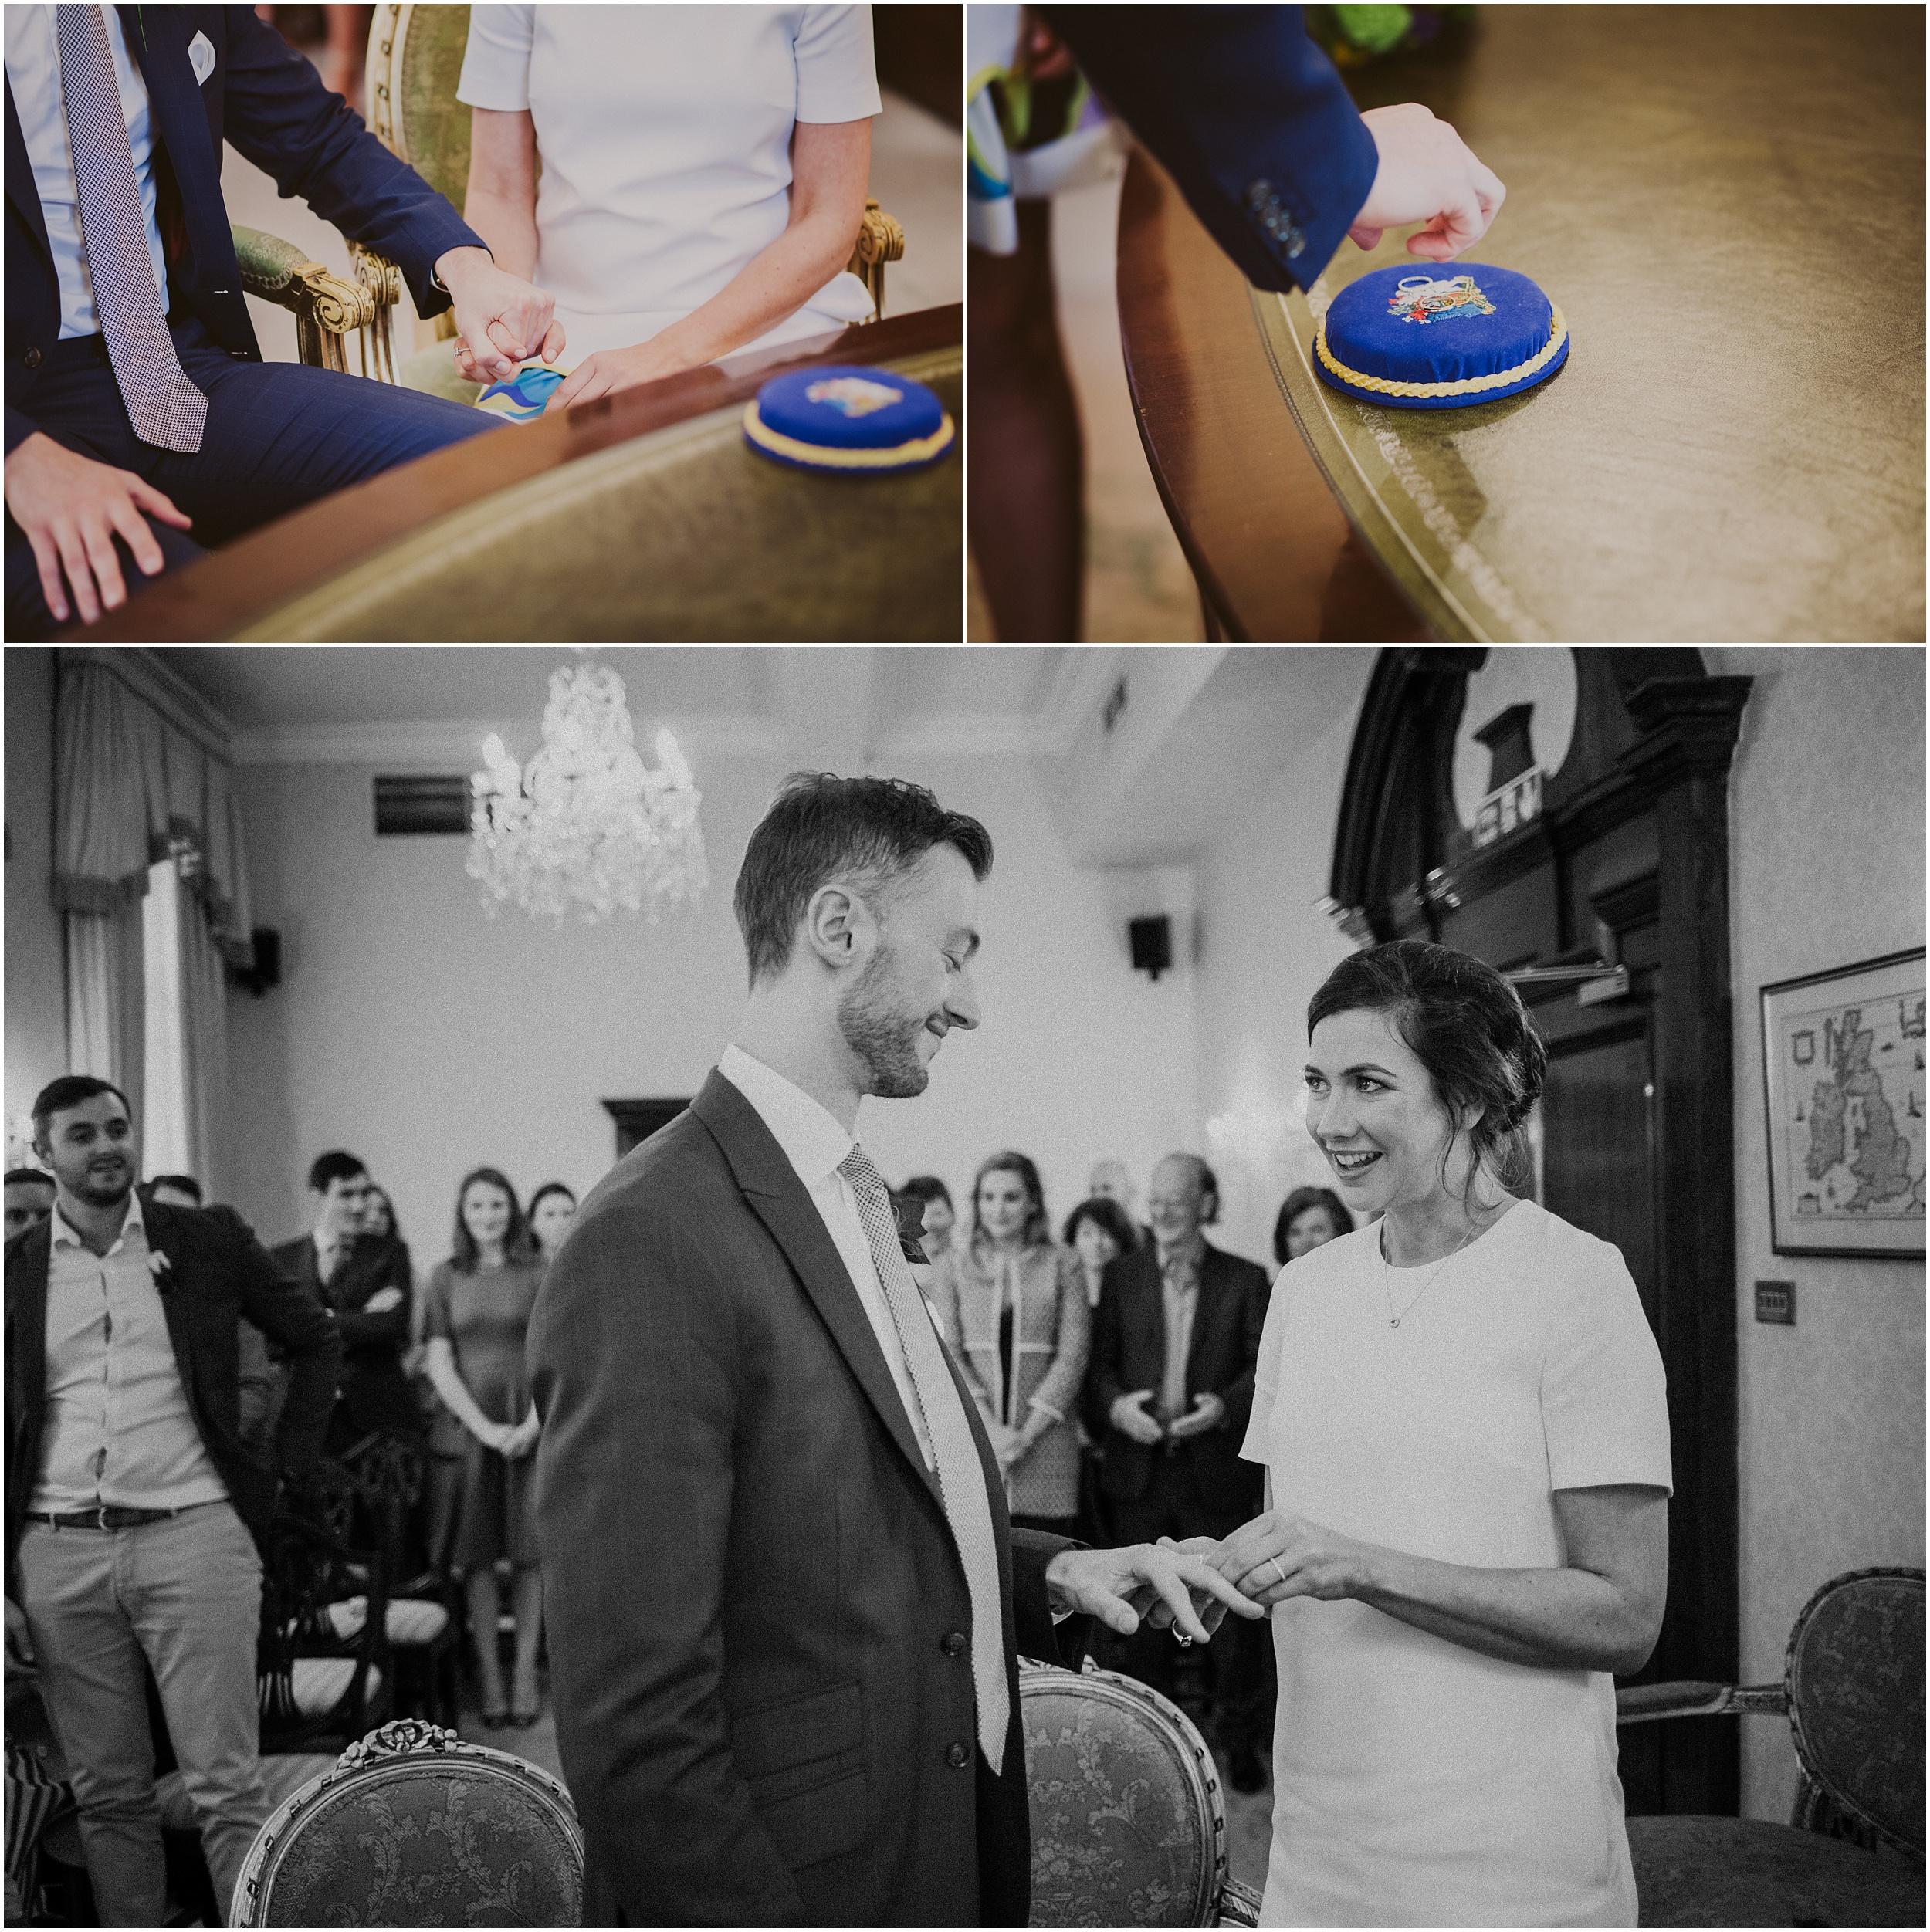 1_170506_Seb&Luise_Ceremony-28.jpg